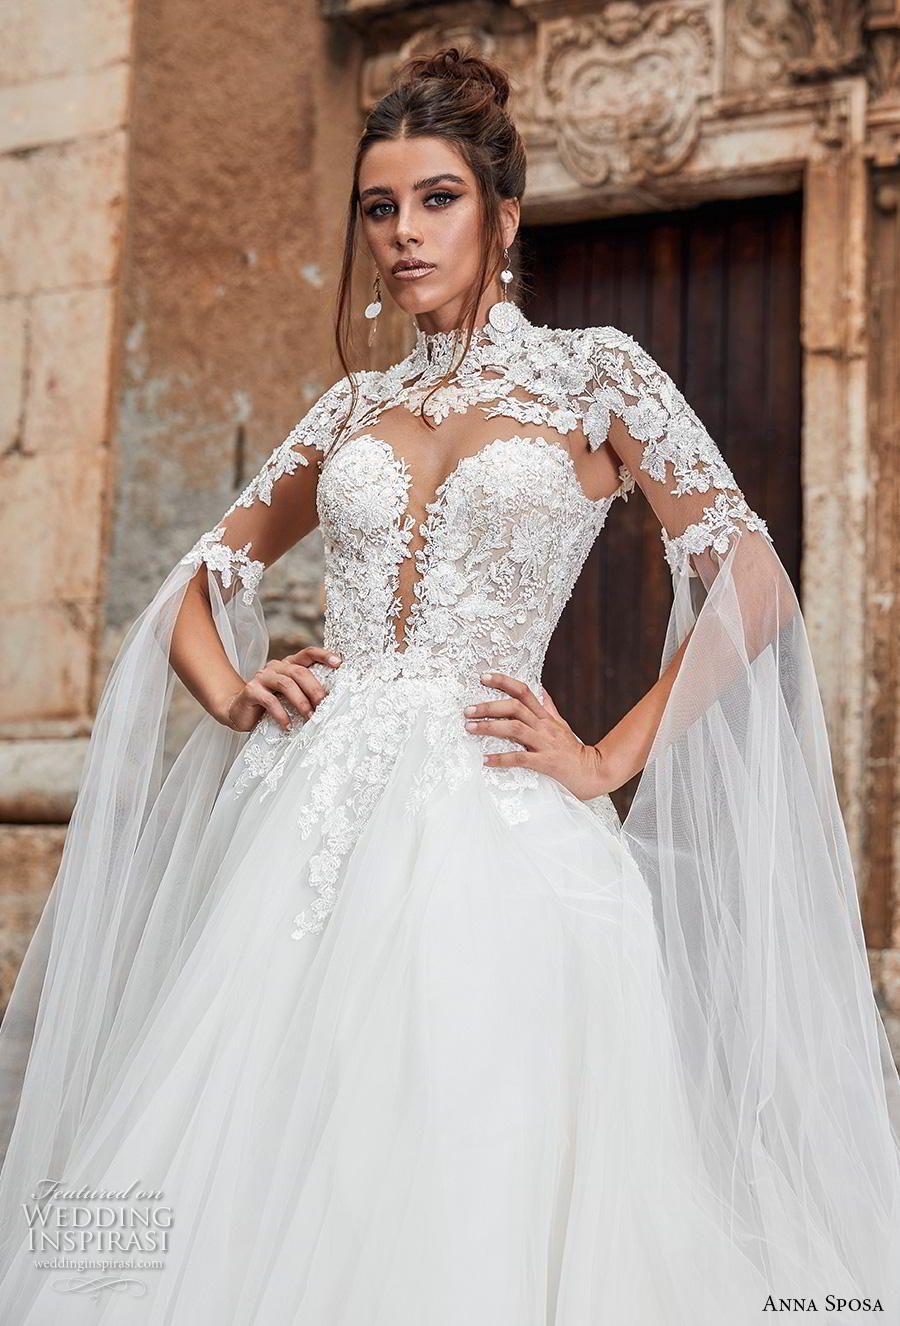 Lace dress with shorts underneath september 2019 Anna Sposa  Wedding Dresses u ucBella Siciliaud Bridal Collection